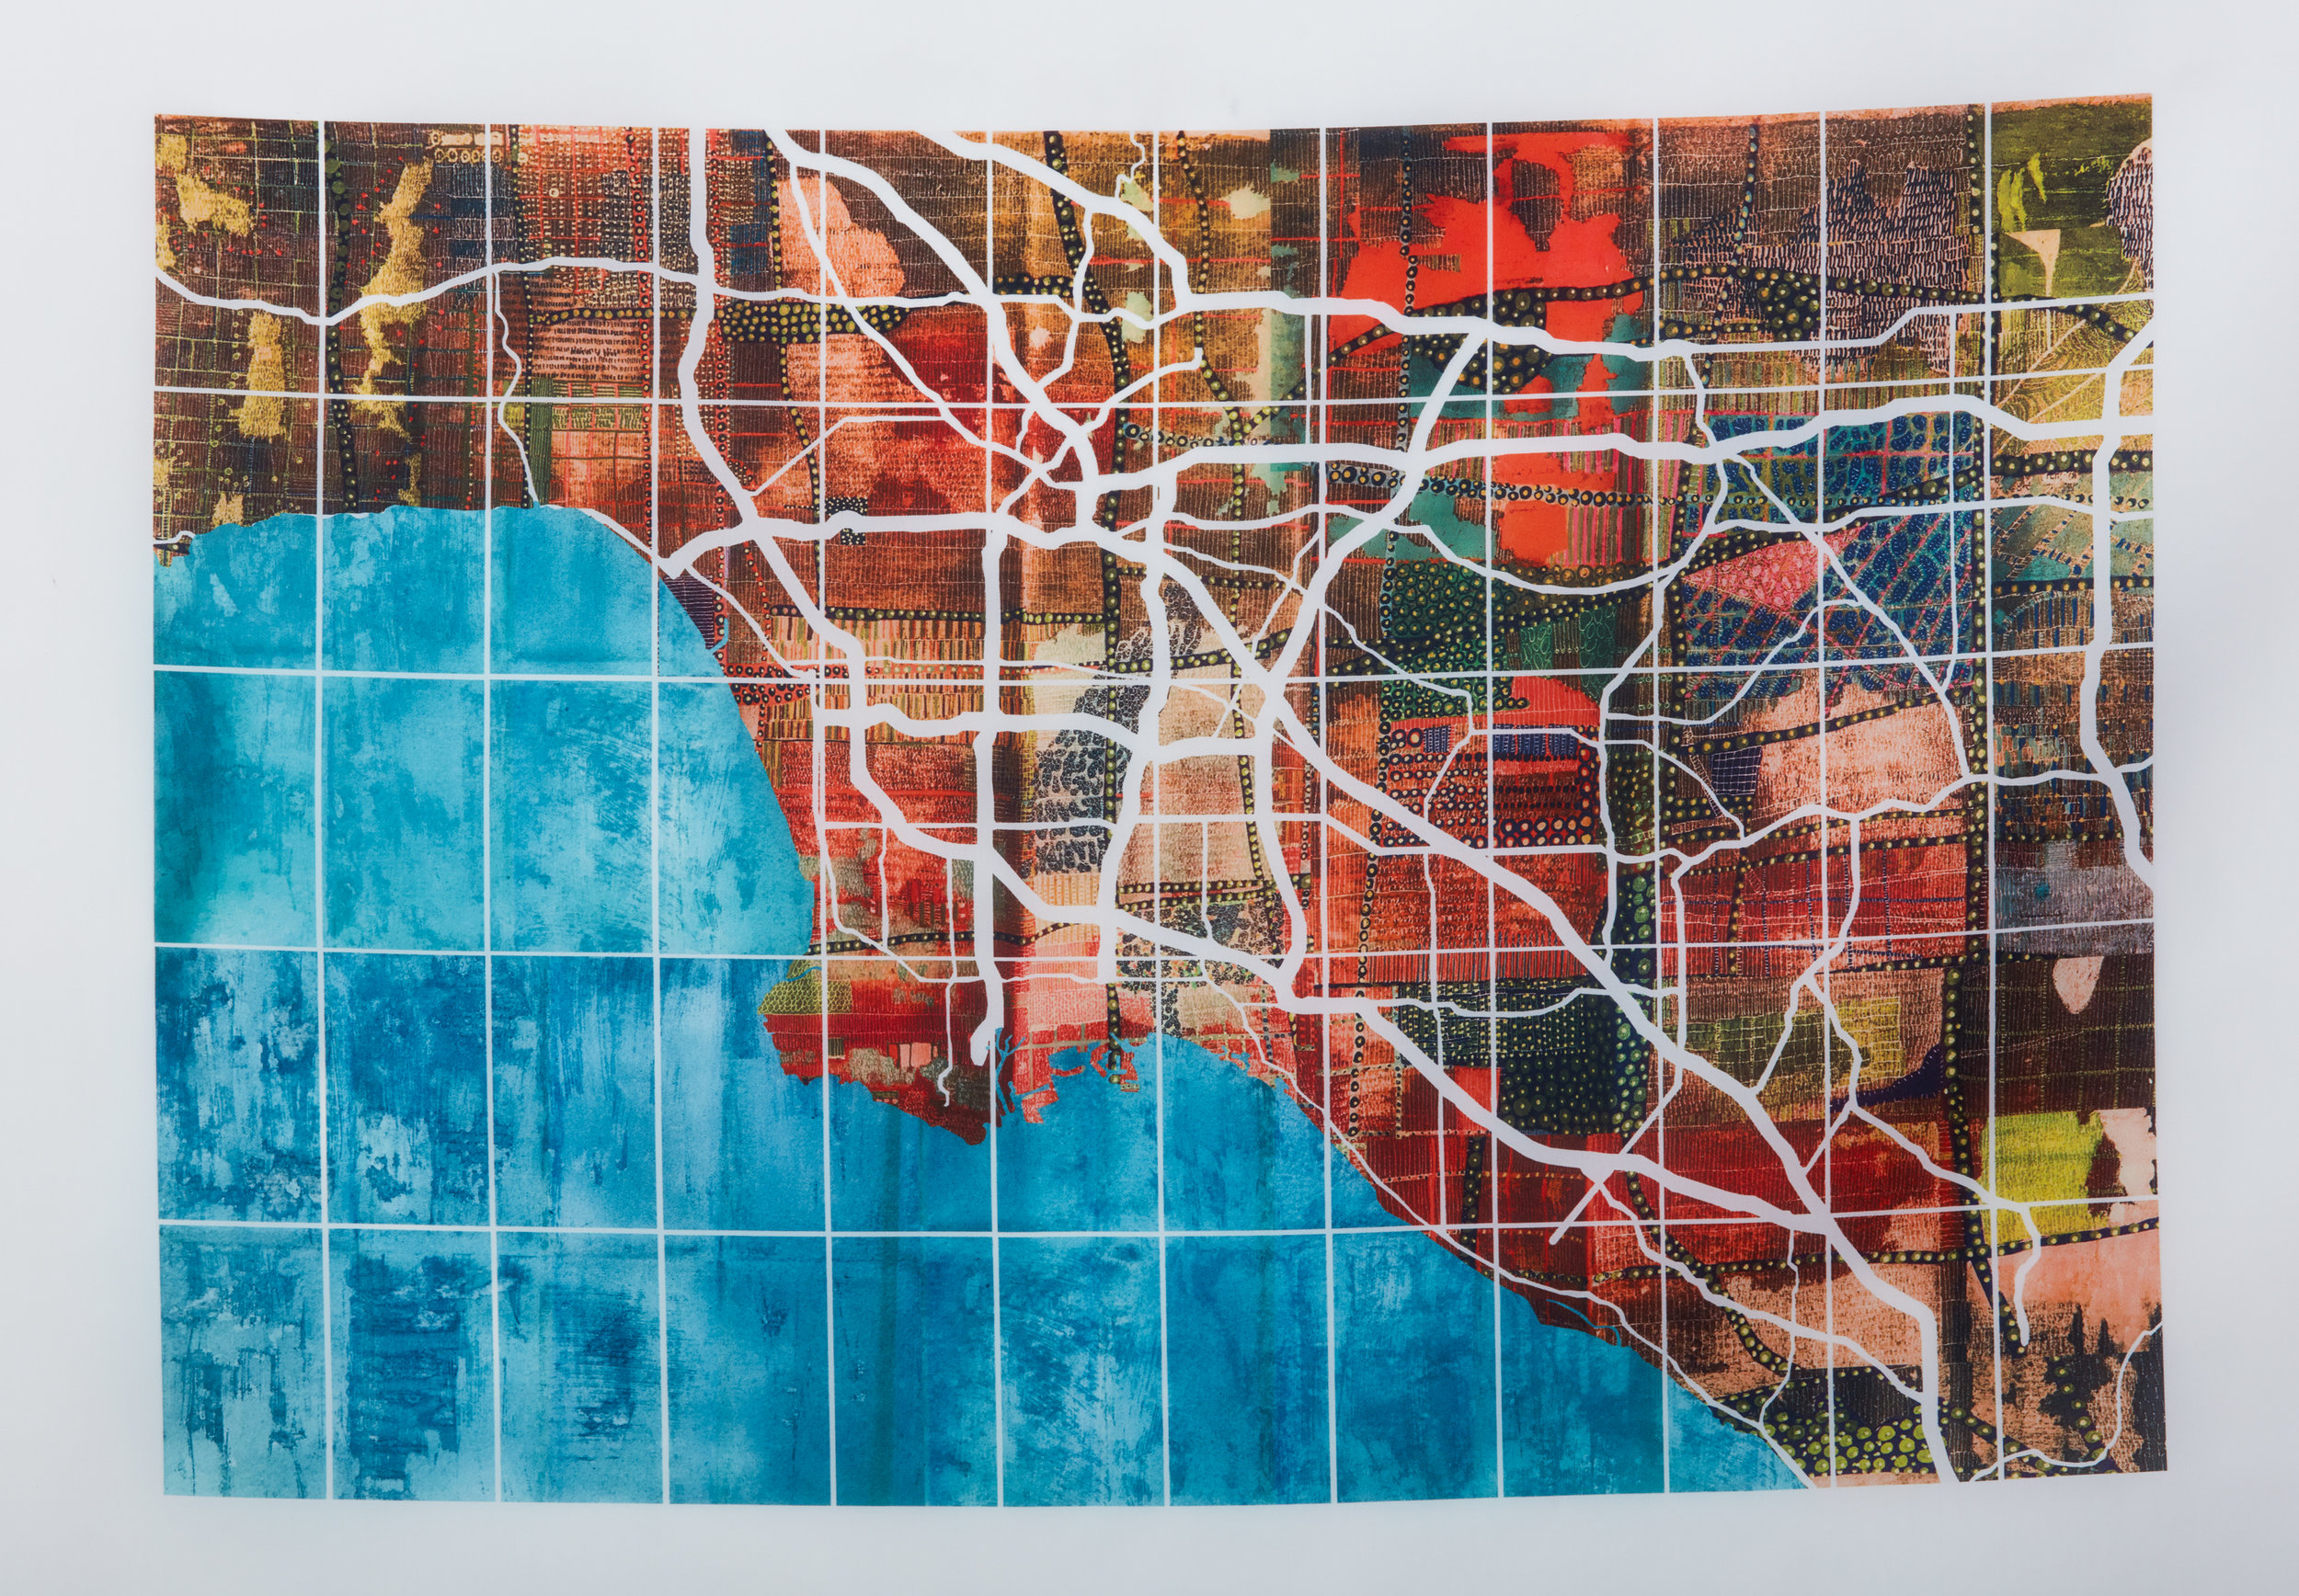 Los Angeles New Hue, 2017. Ink jet on organza silk, 108 x 133cm